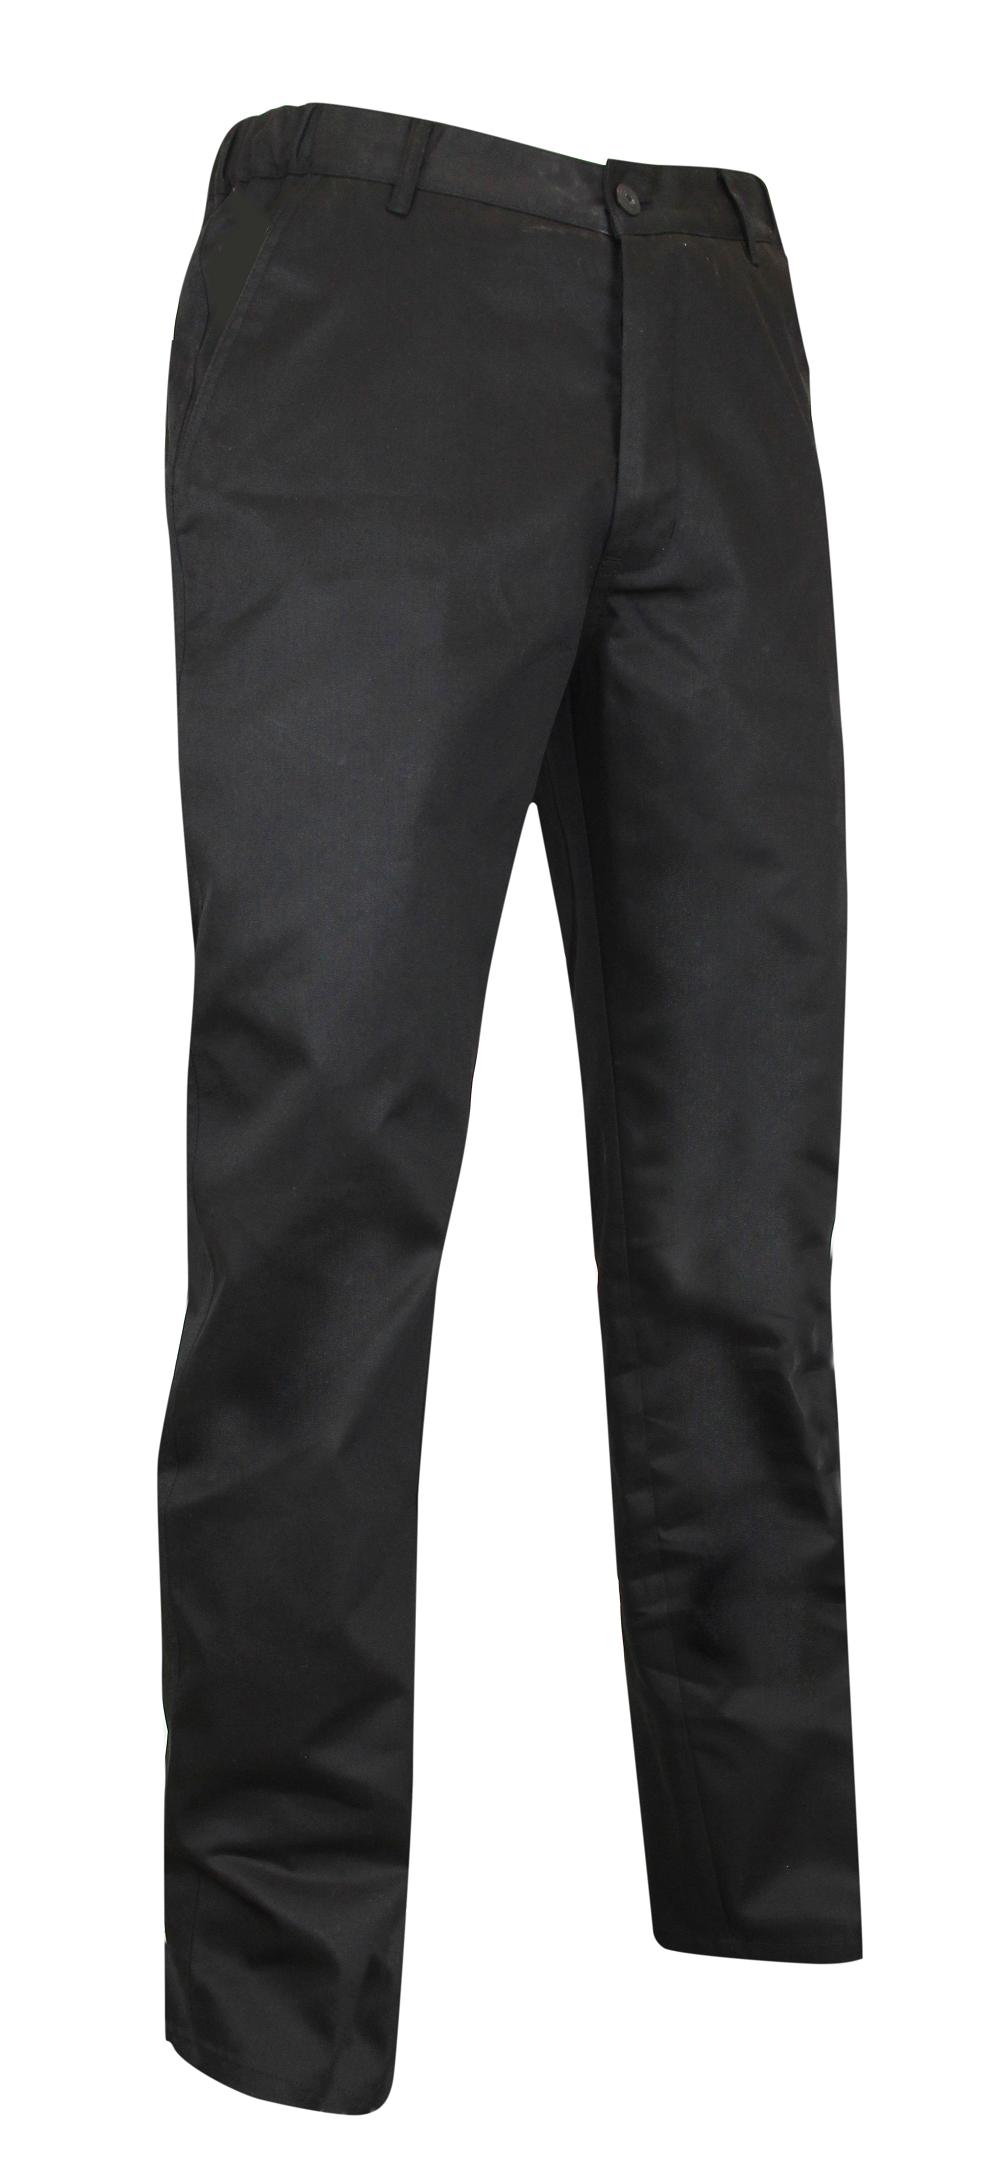 Pantalon de cuisinier noir...